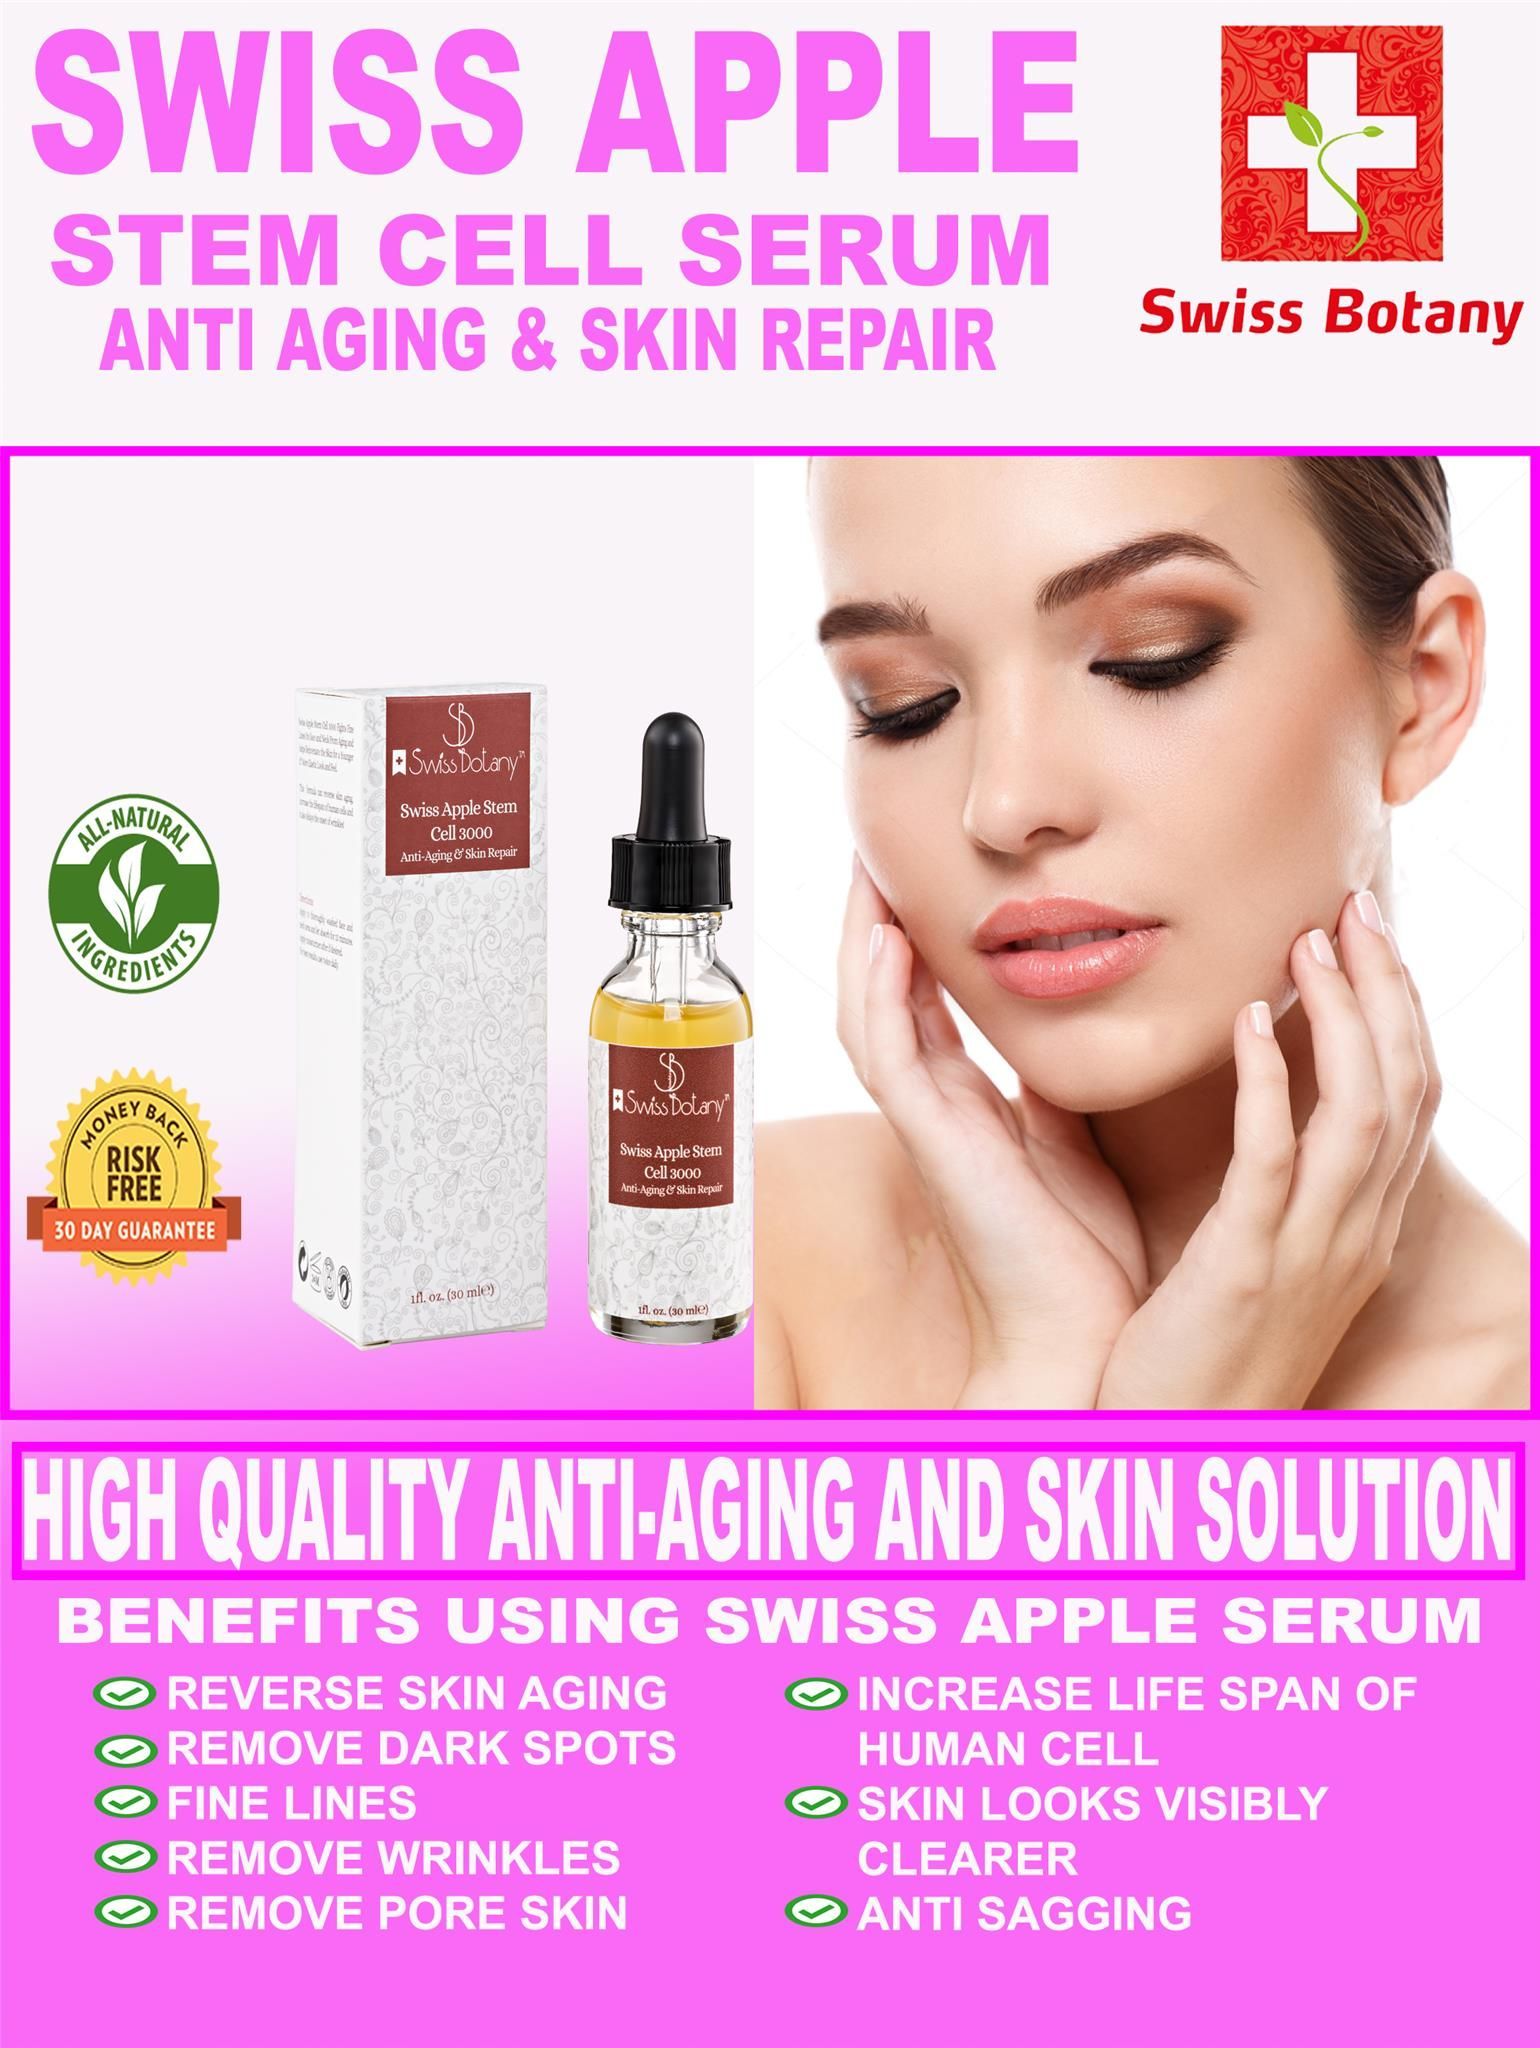 Swiss Apple Stem Cell Serum High Quality Stem Cell serum